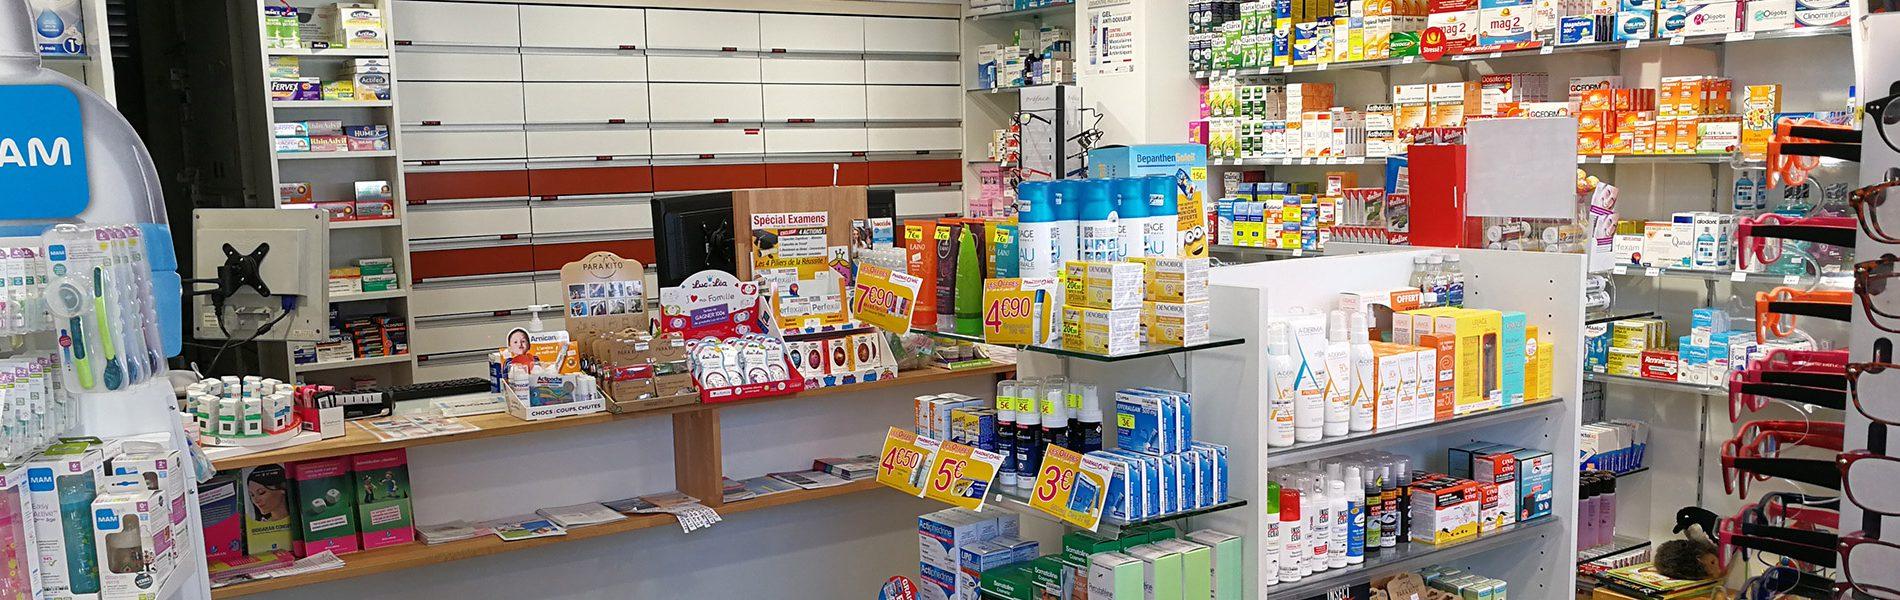 Pharmacie ANDRIAMANJATO - Image Homepage 2